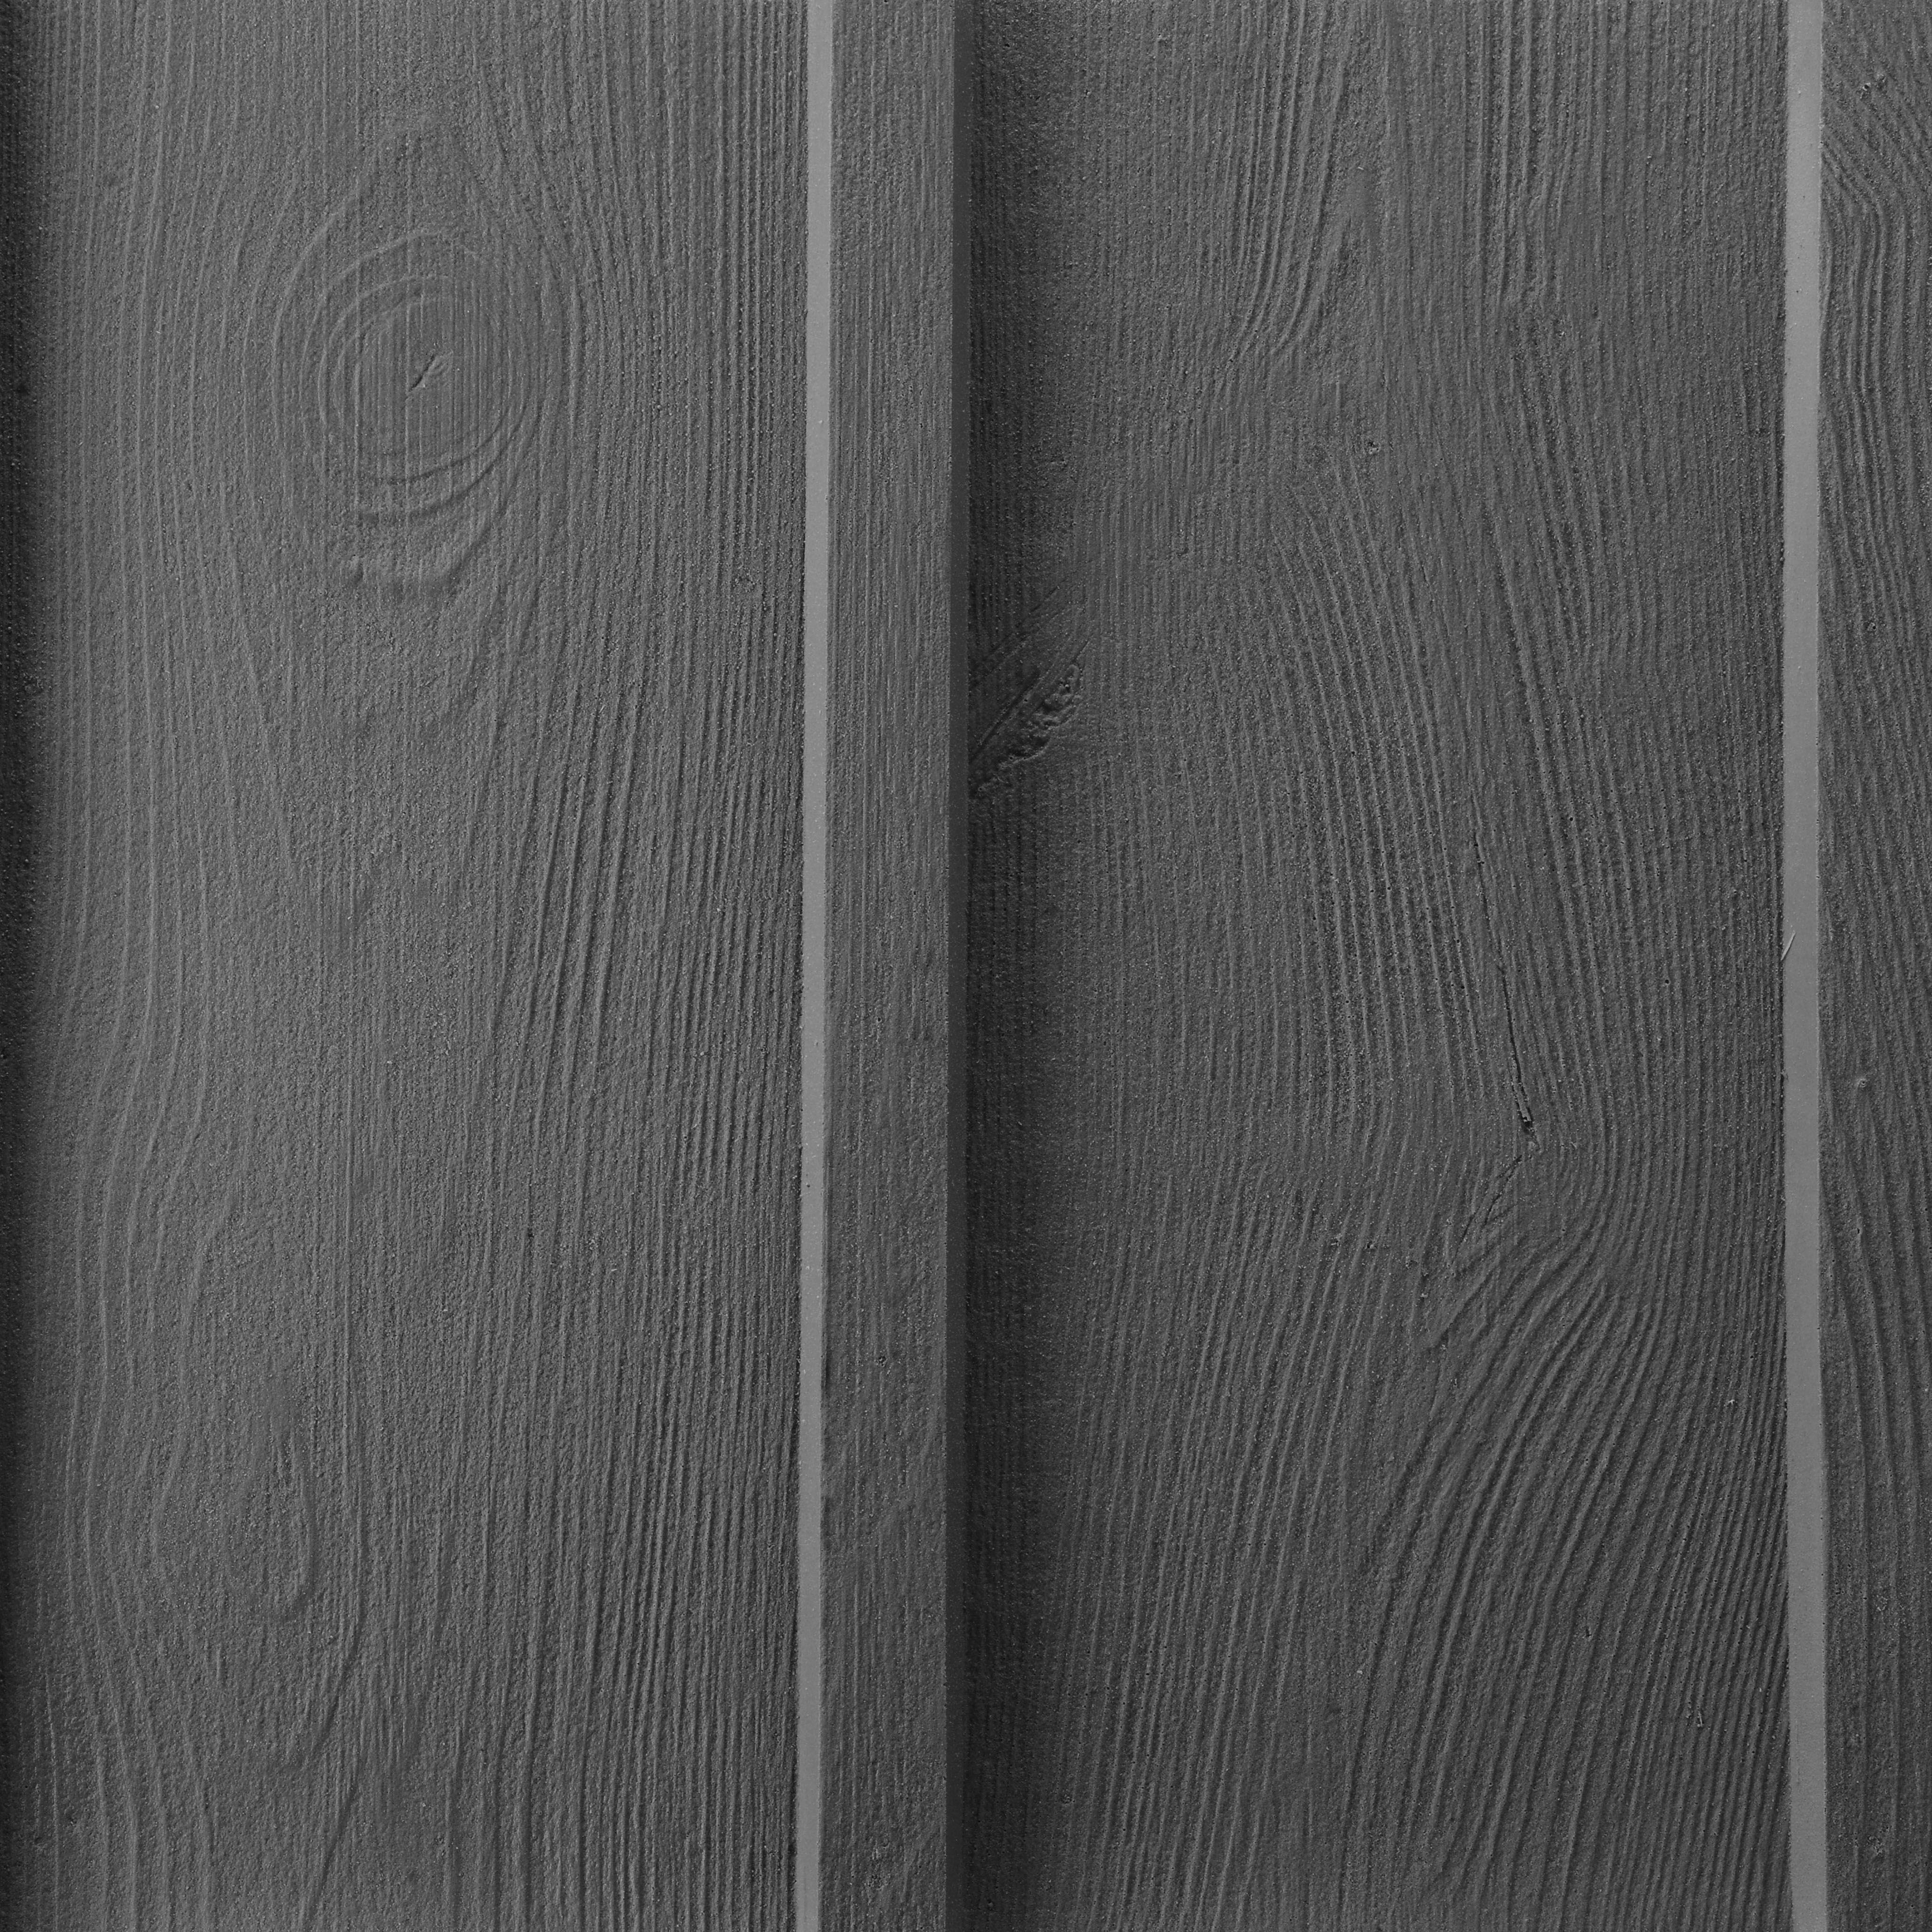 Board And Batten 517 Formliner Concrete Woodtexture Precast Tiltup Castinplace Board And Batten Batten Concrete Texture